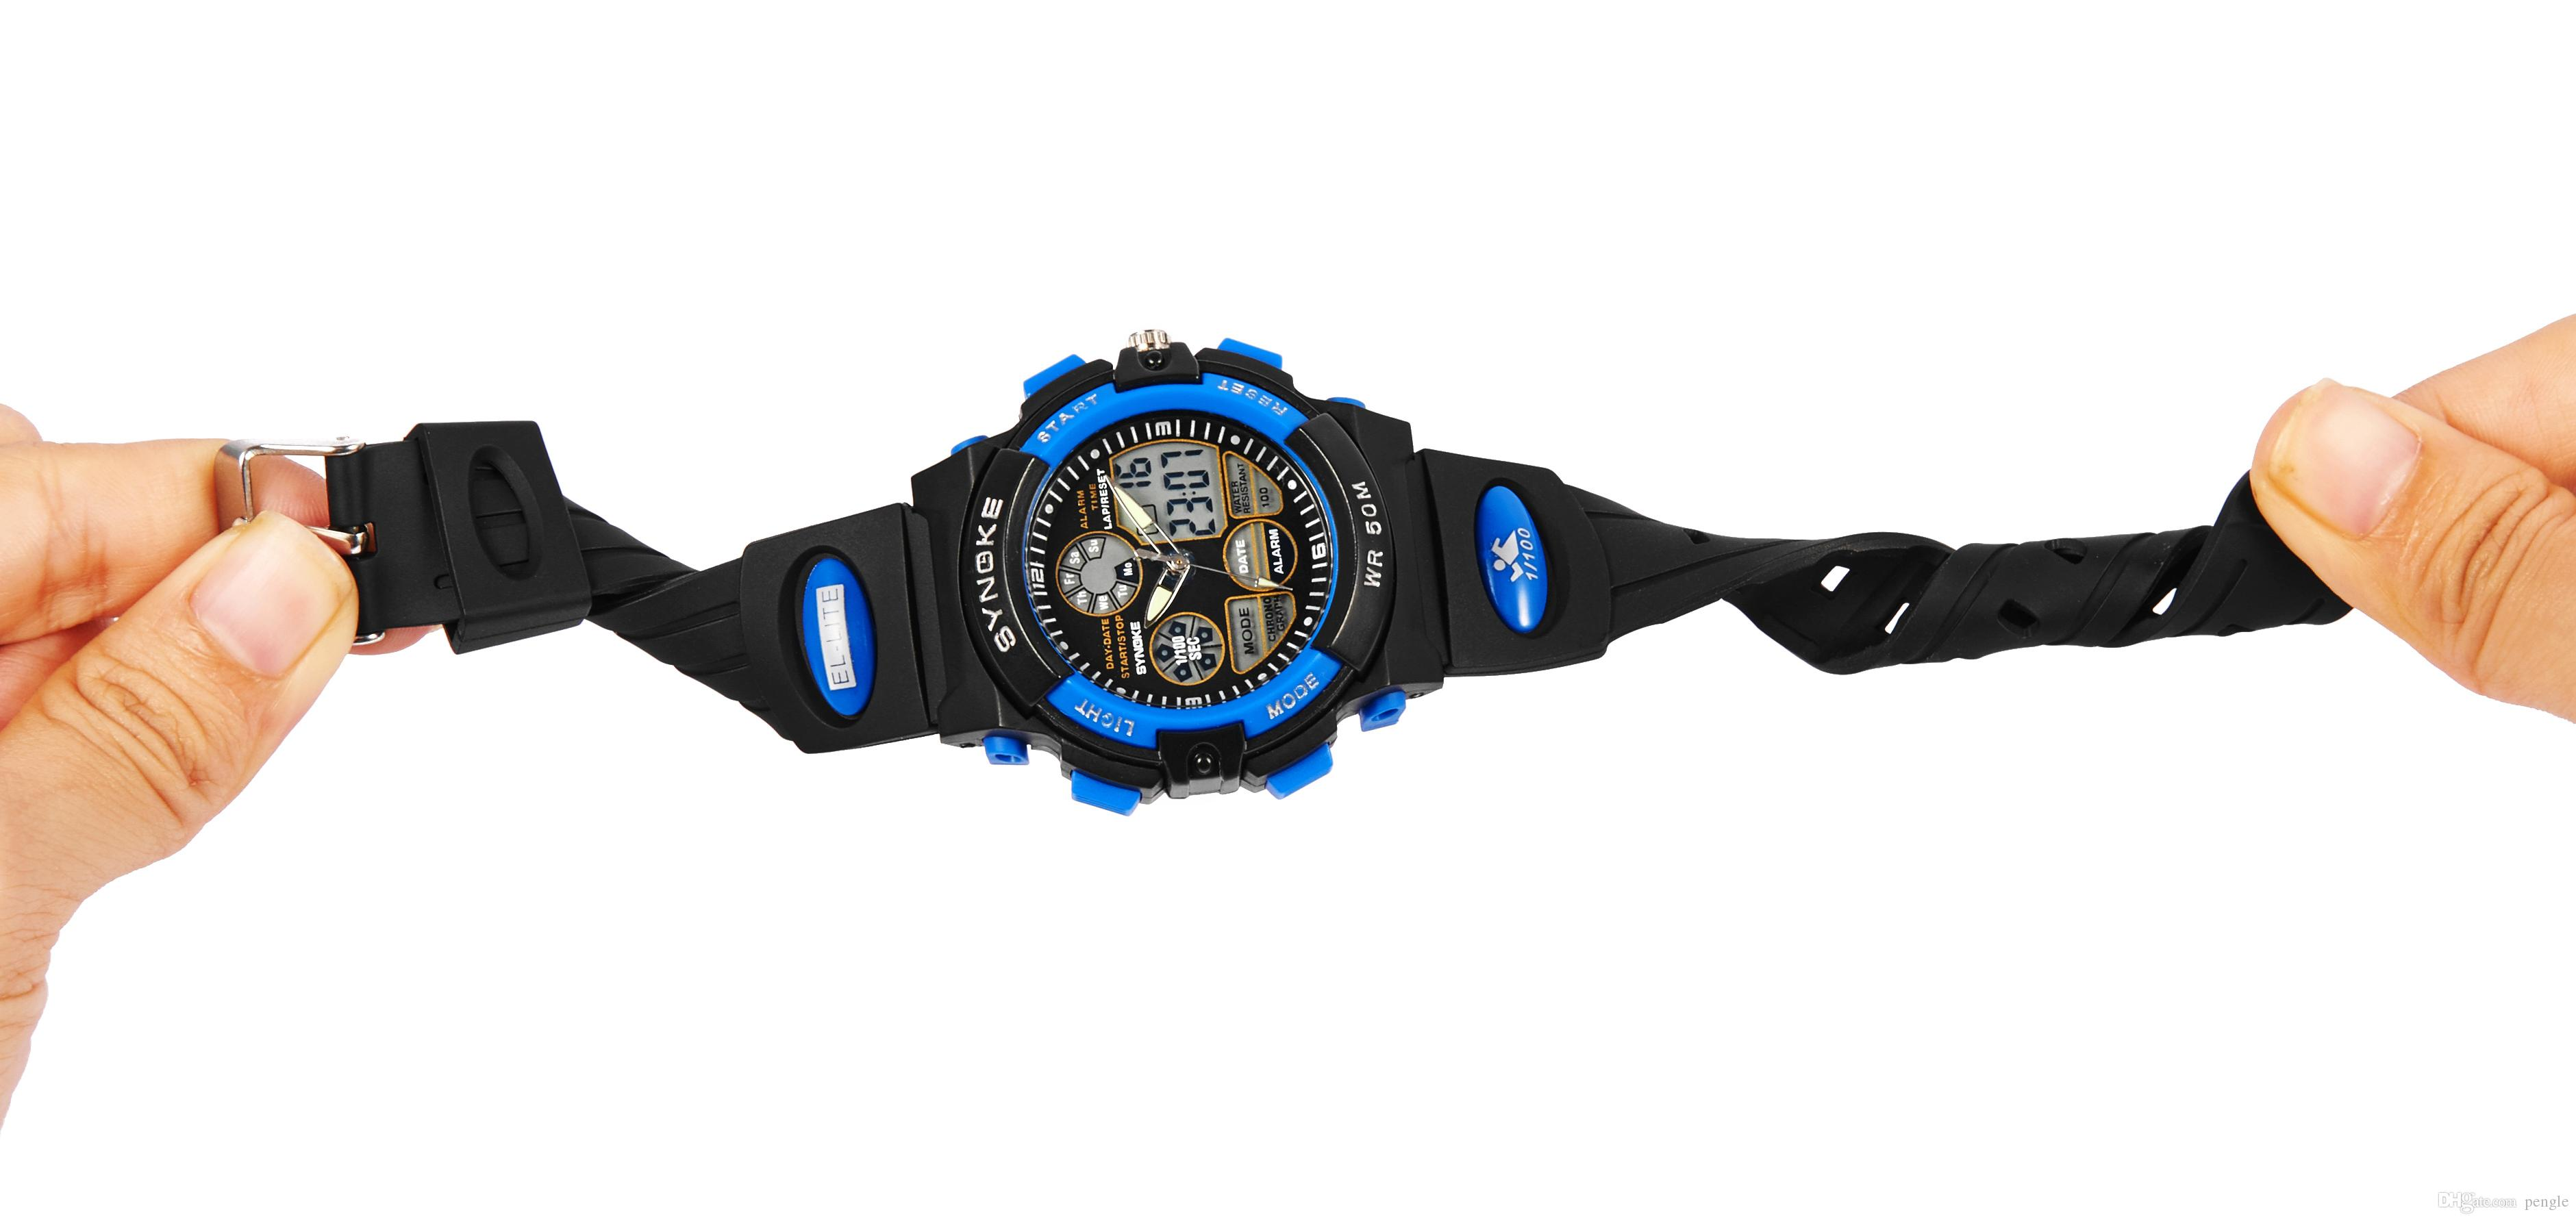 New Fashion Sports Men Digital Watch LED Luminous Watch Dual Display Deep Waterproof Wrist Watch For Children